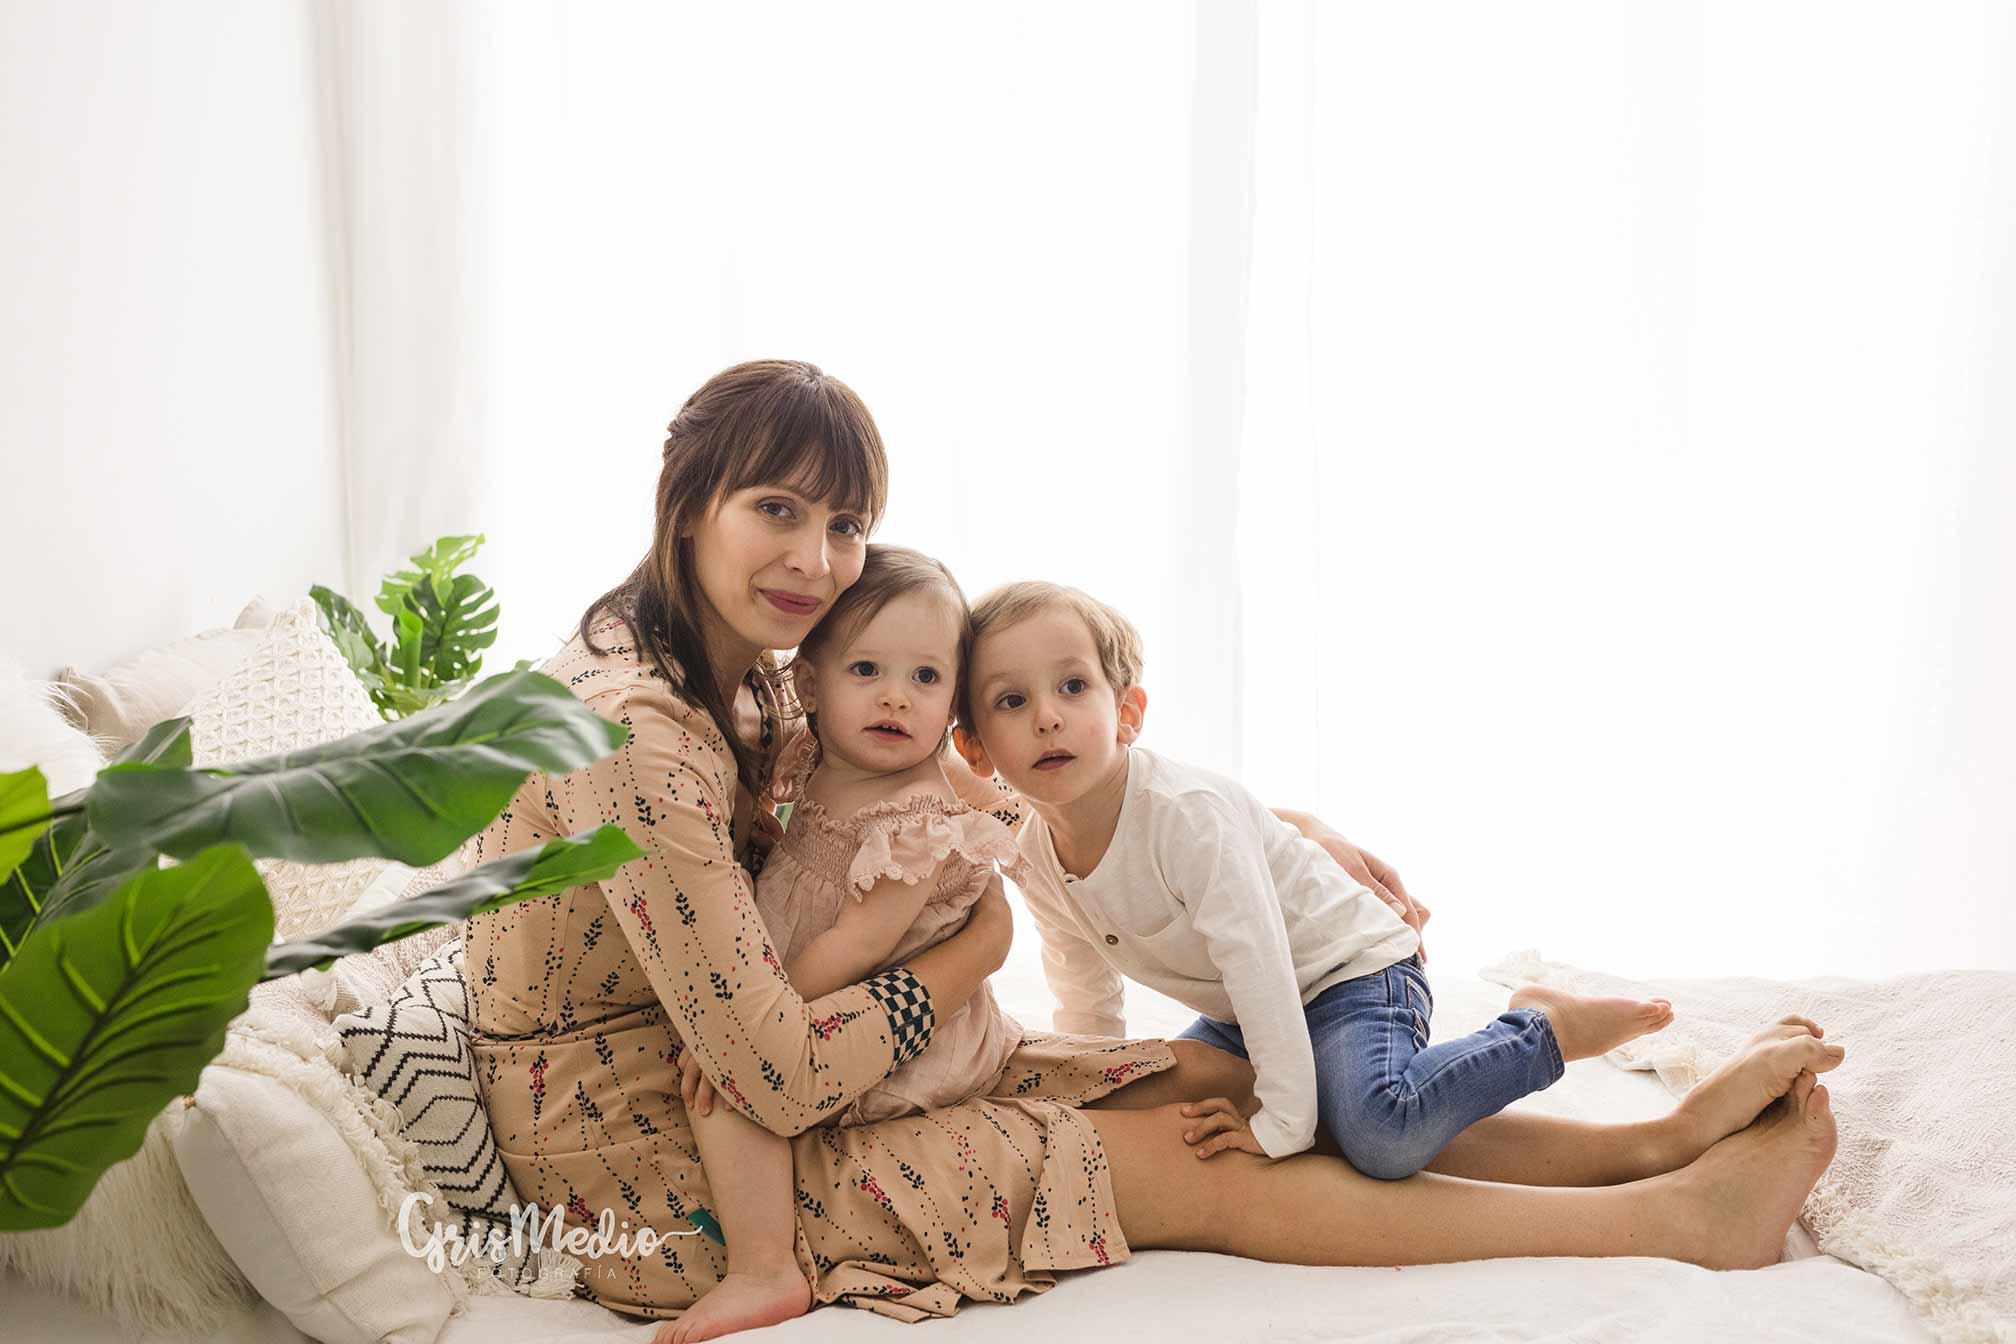 fotografia-familia-infantil-zaragoza-grismedio-bebe-lactancia10